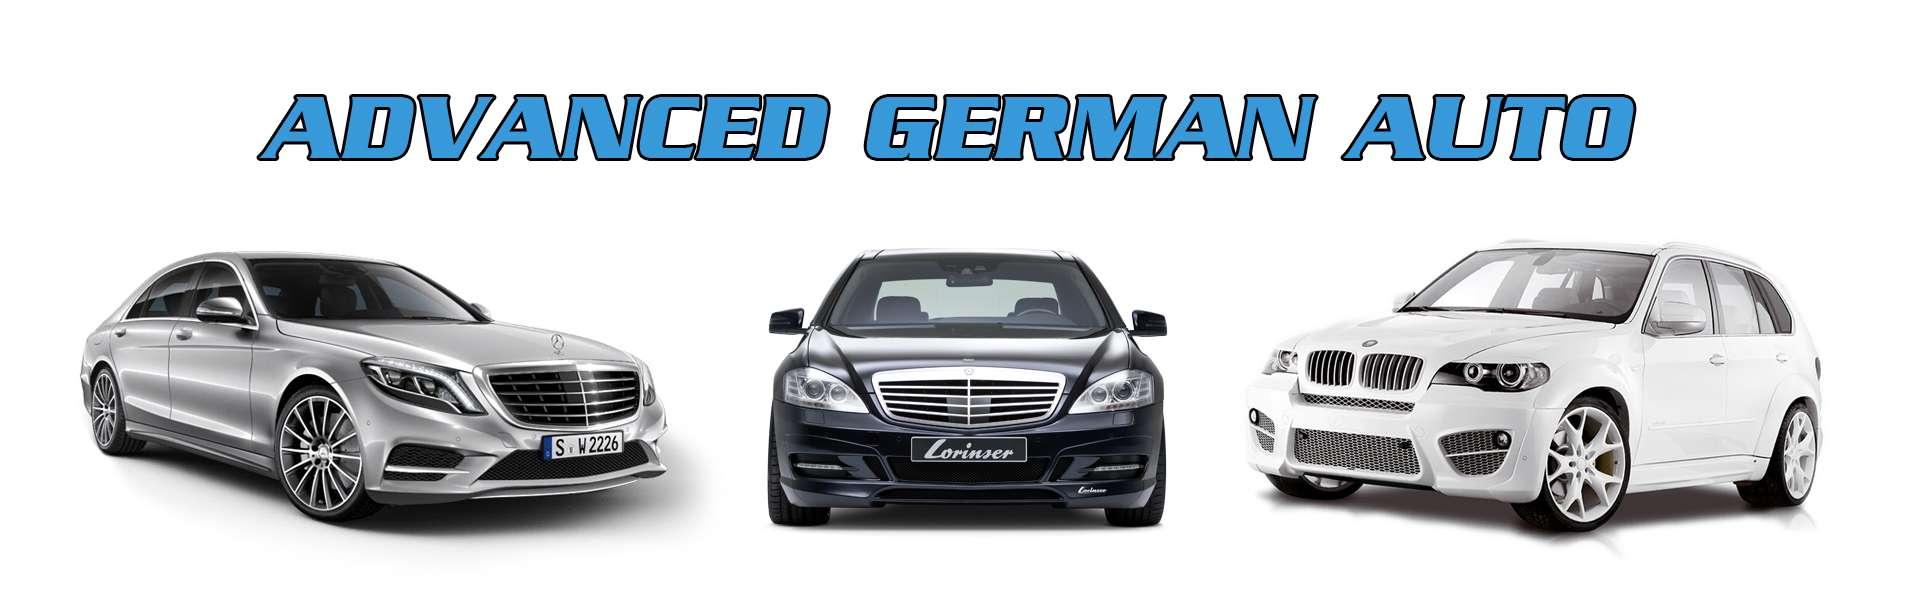 Advanced german auto-1.jpg